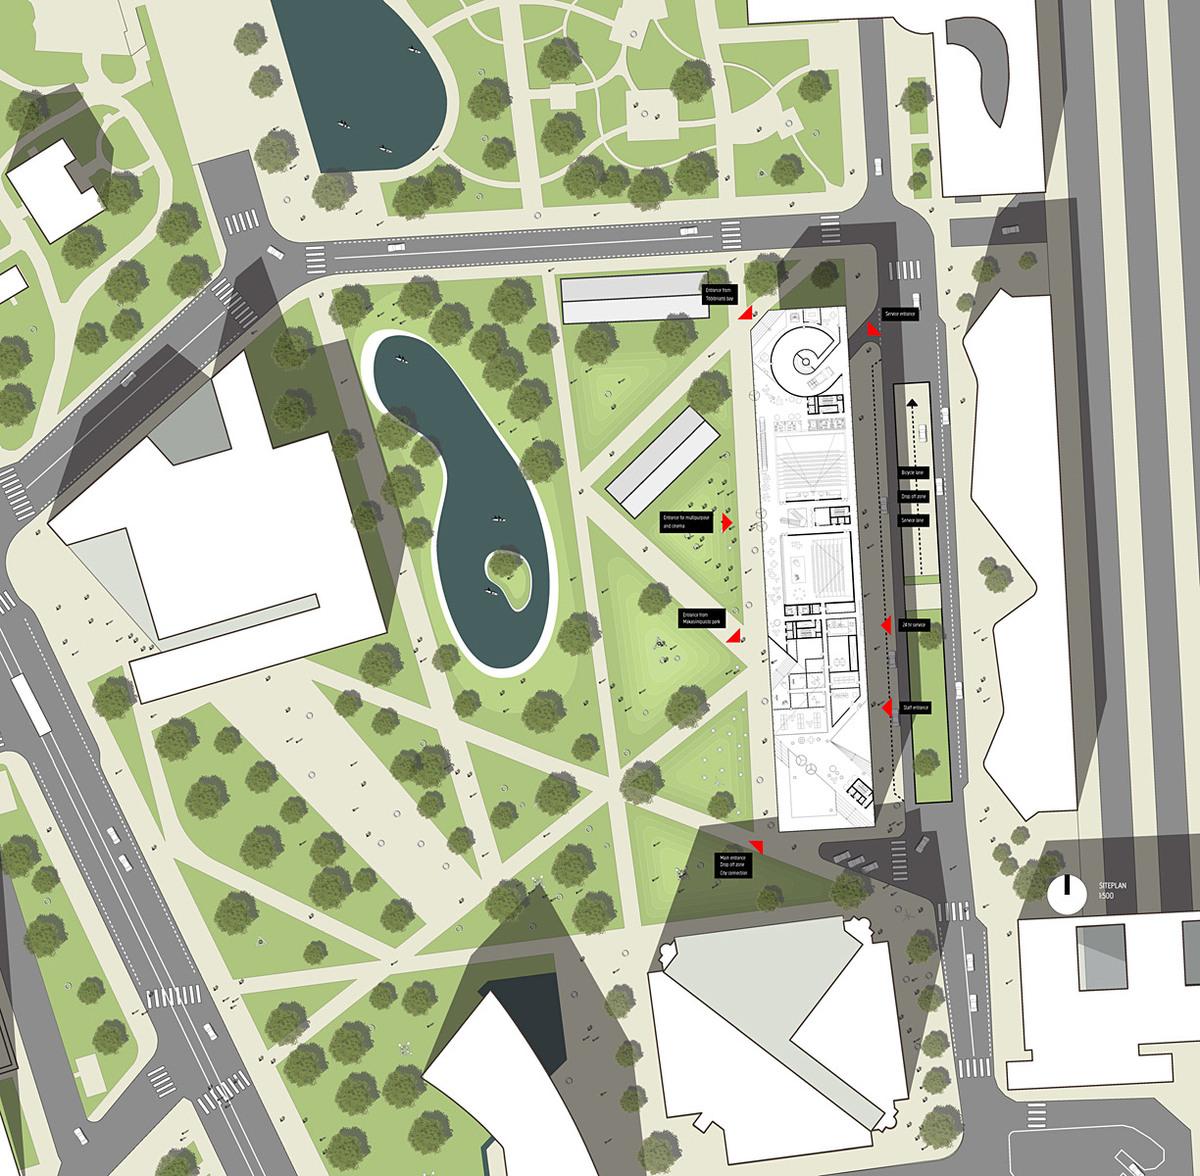 Site plan (Image: OYO + office9 + Ingenium)